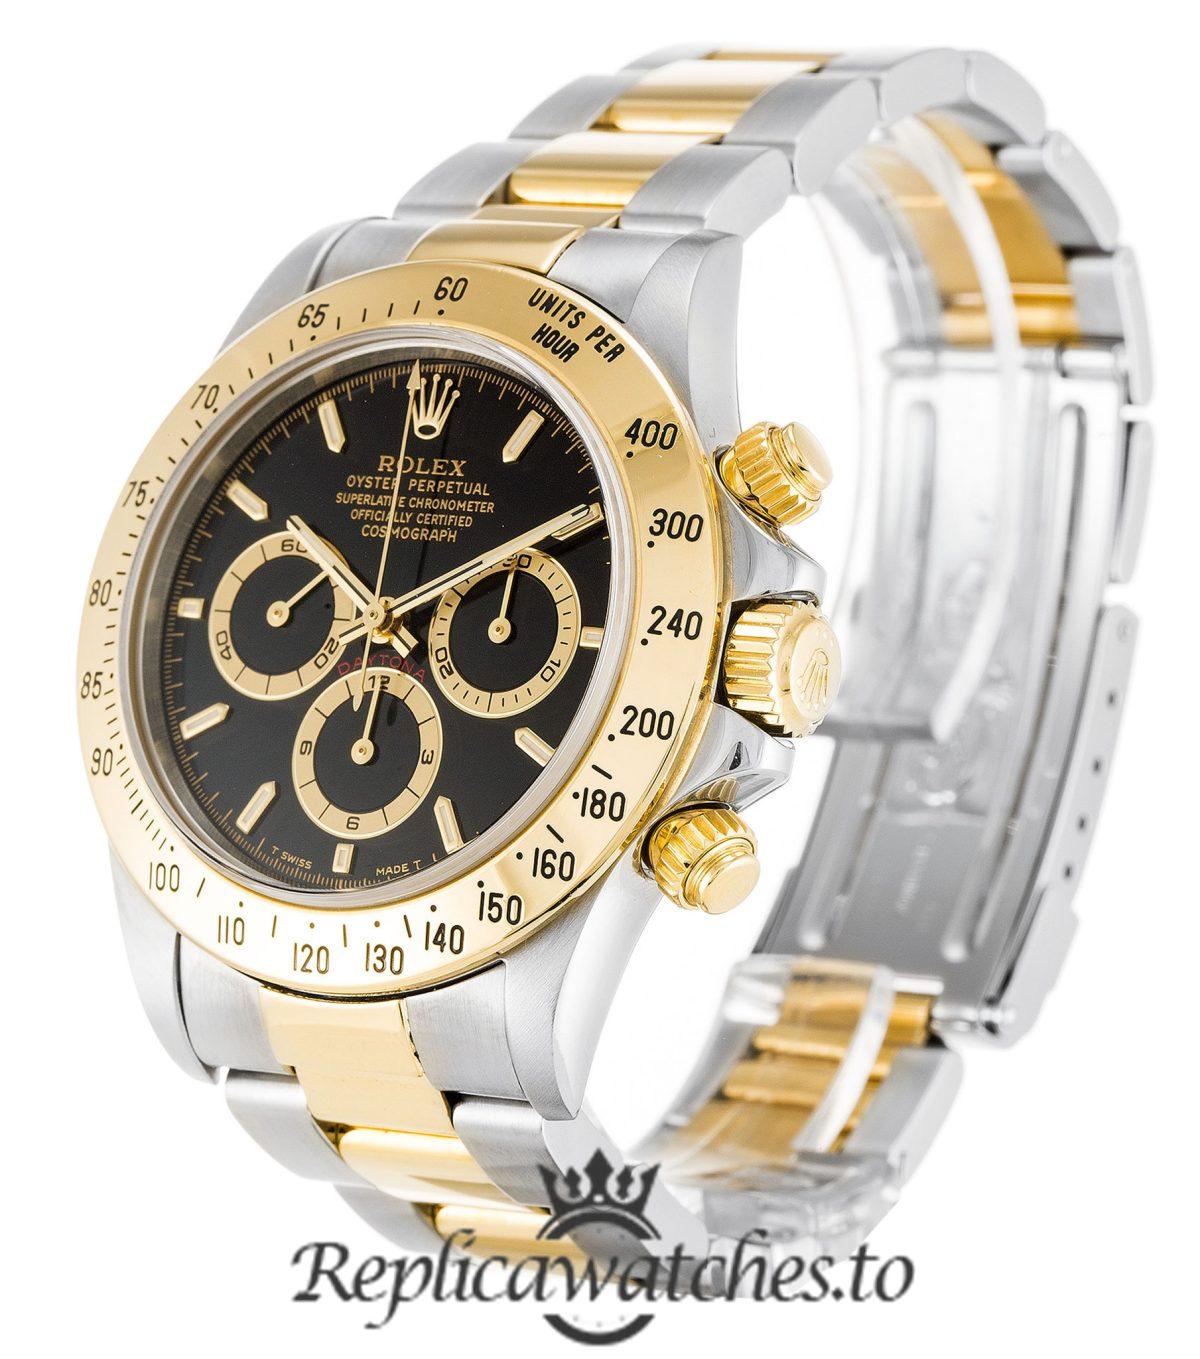 Rolex Daytona Replica 16523 002 Yellow Gold Bezel 40MM